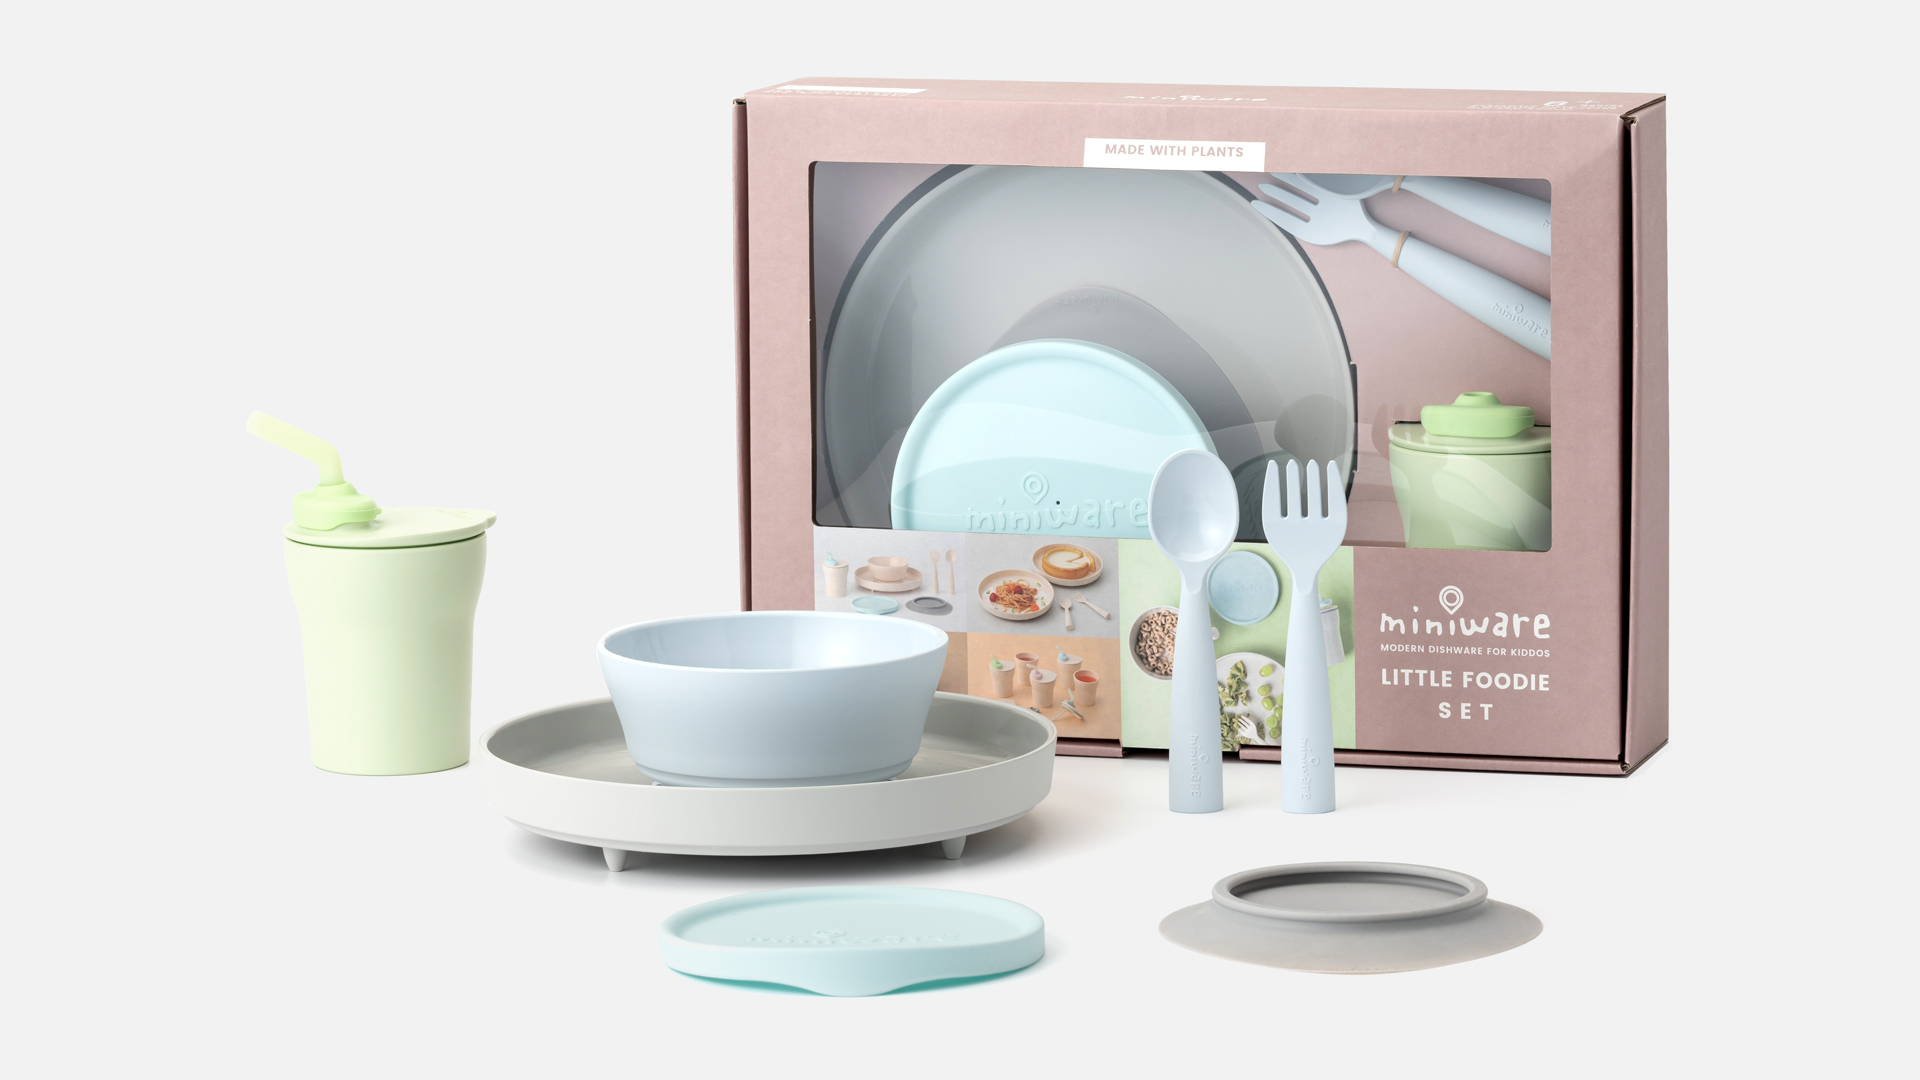 Miniware dining sets